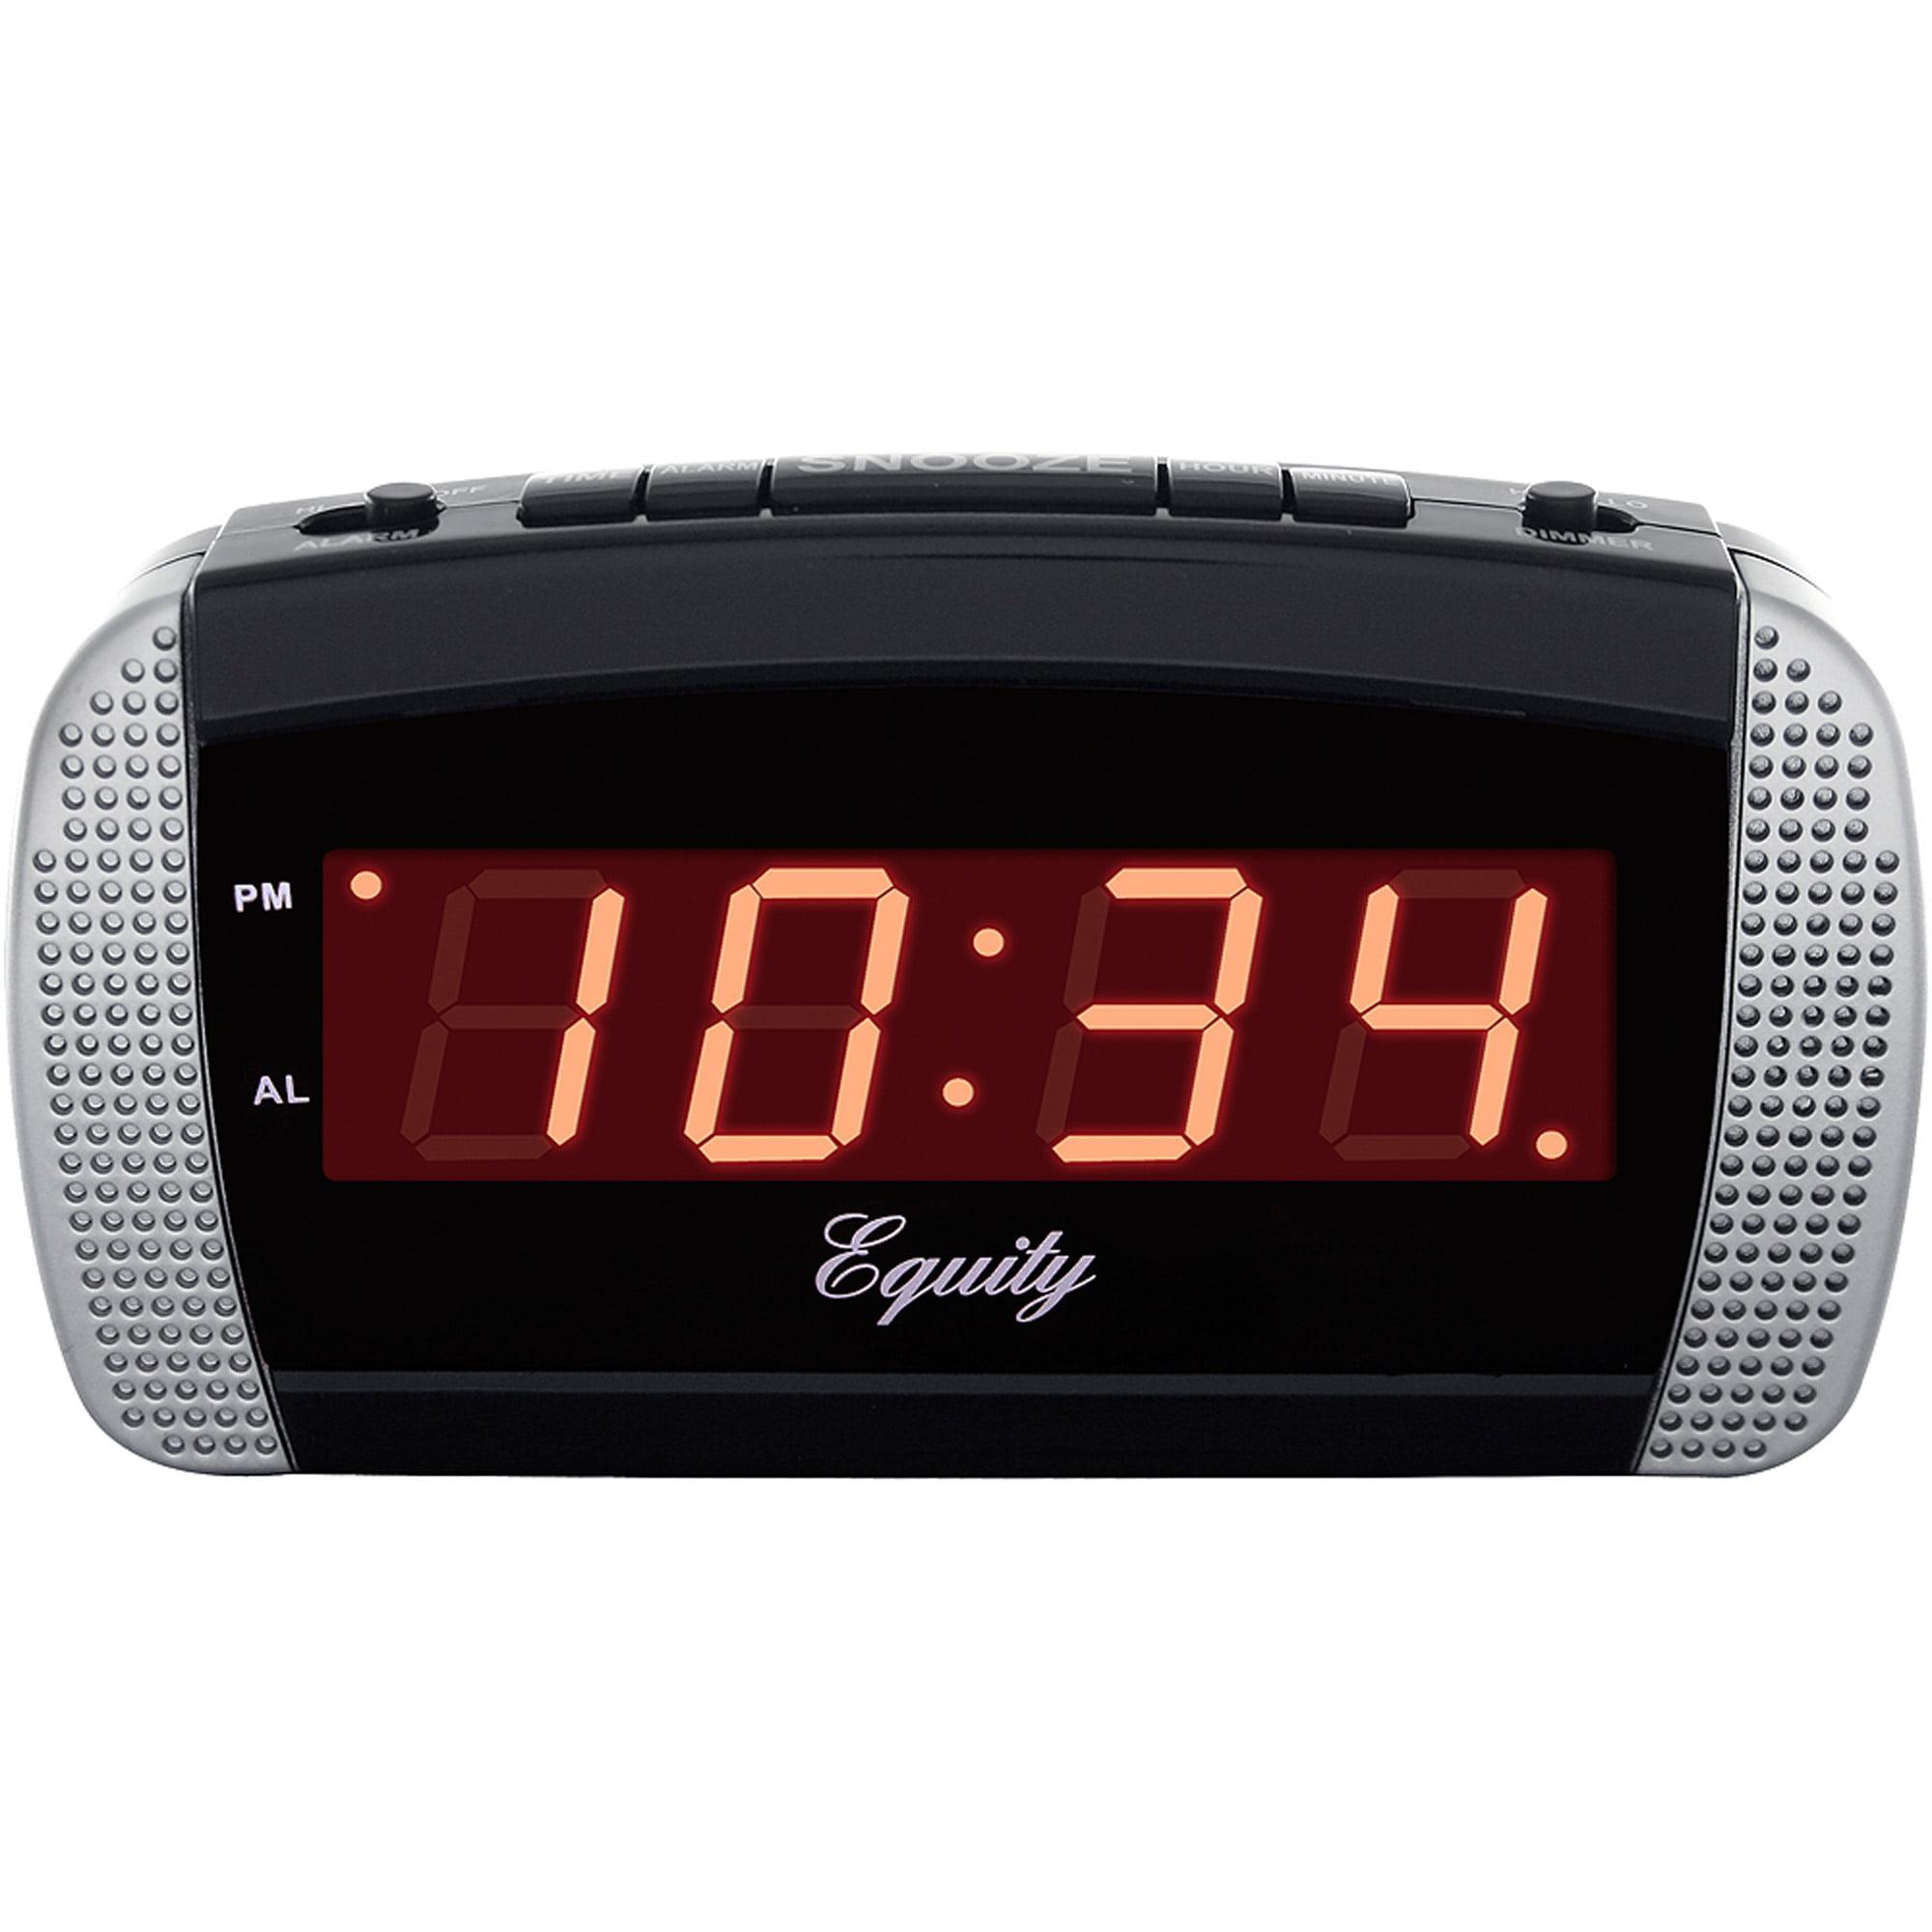 la crosse technology color alarm clock with indoor temperature and usb port. Black Bedroom Furniture Sets. Home Design Ideas